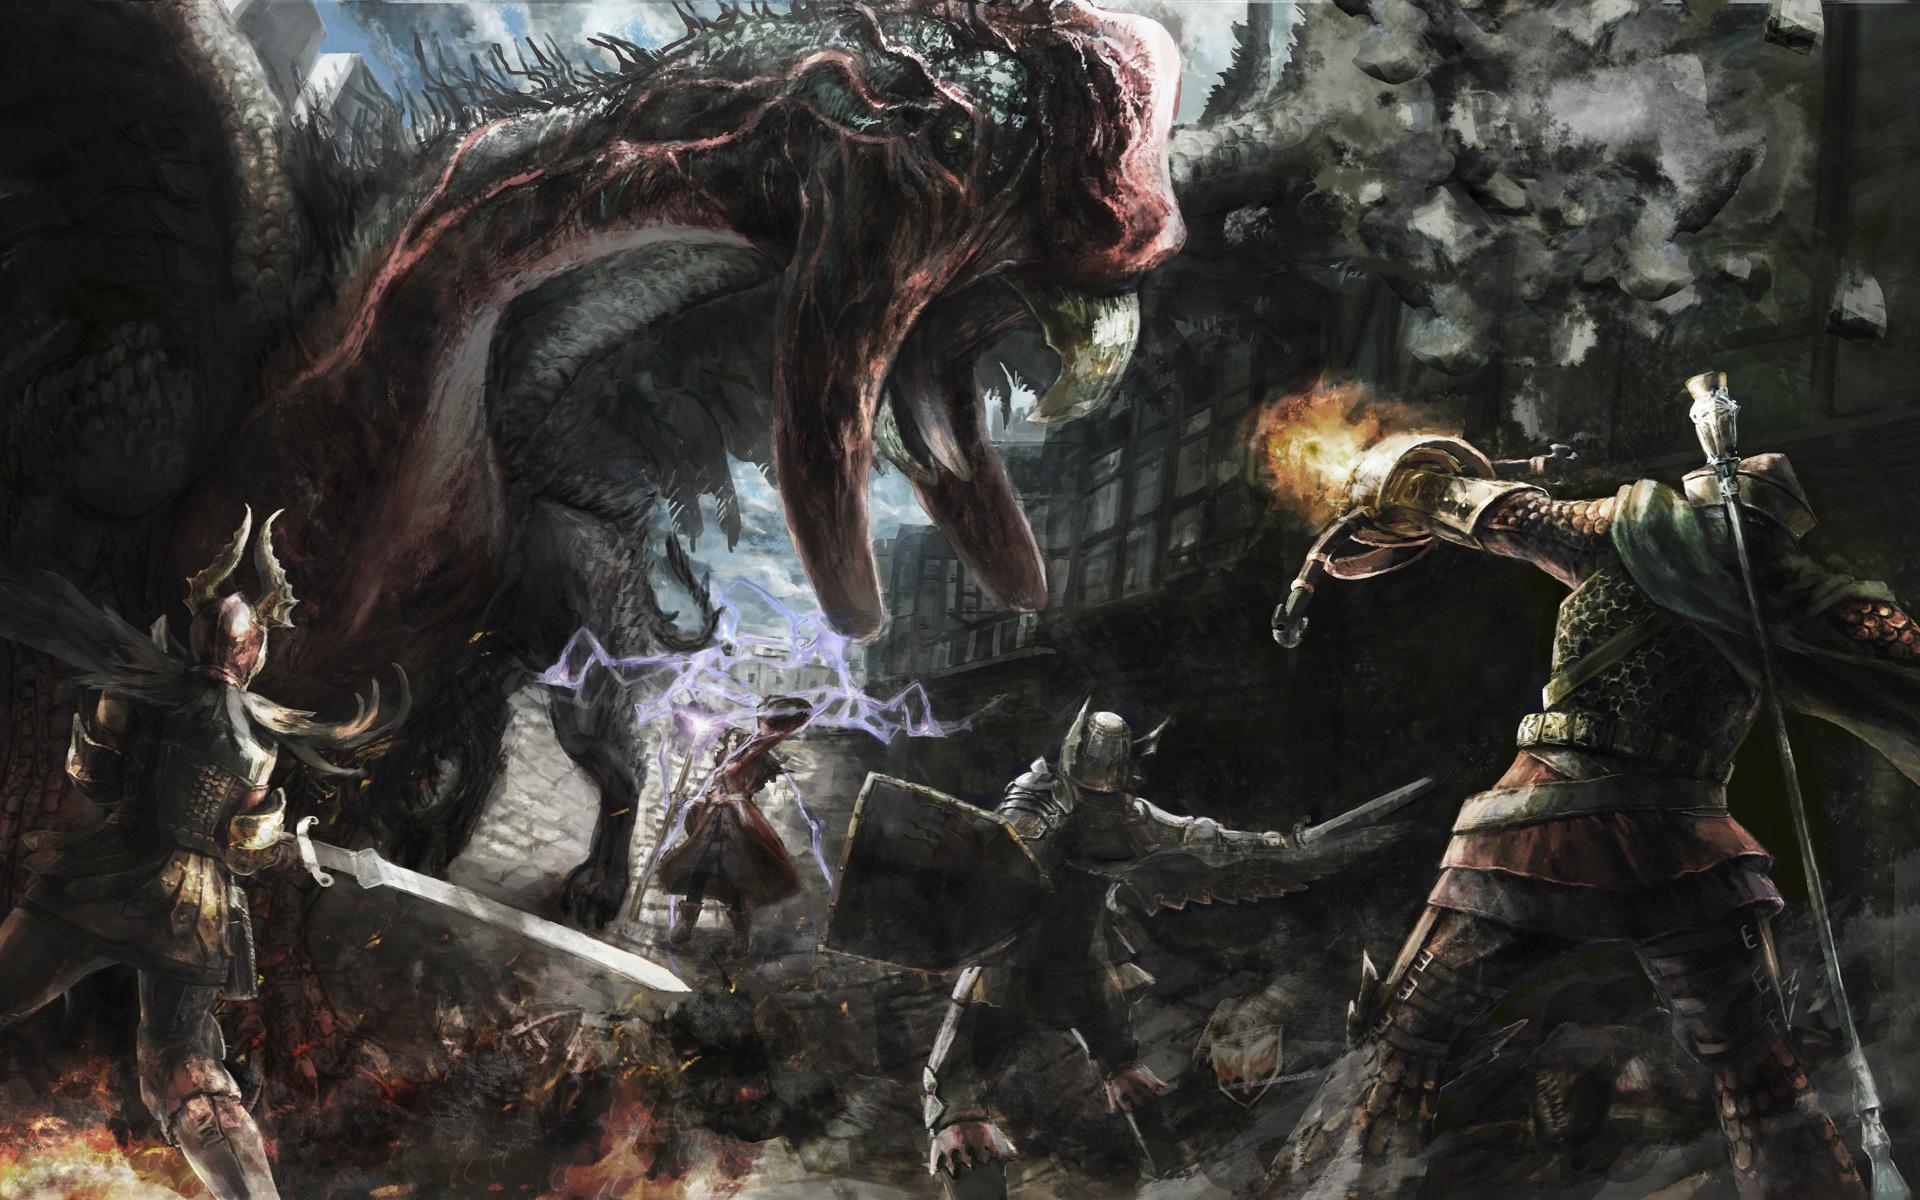 Dragons Dogma Dark Arisen Full HD Wallpaper And Background Image